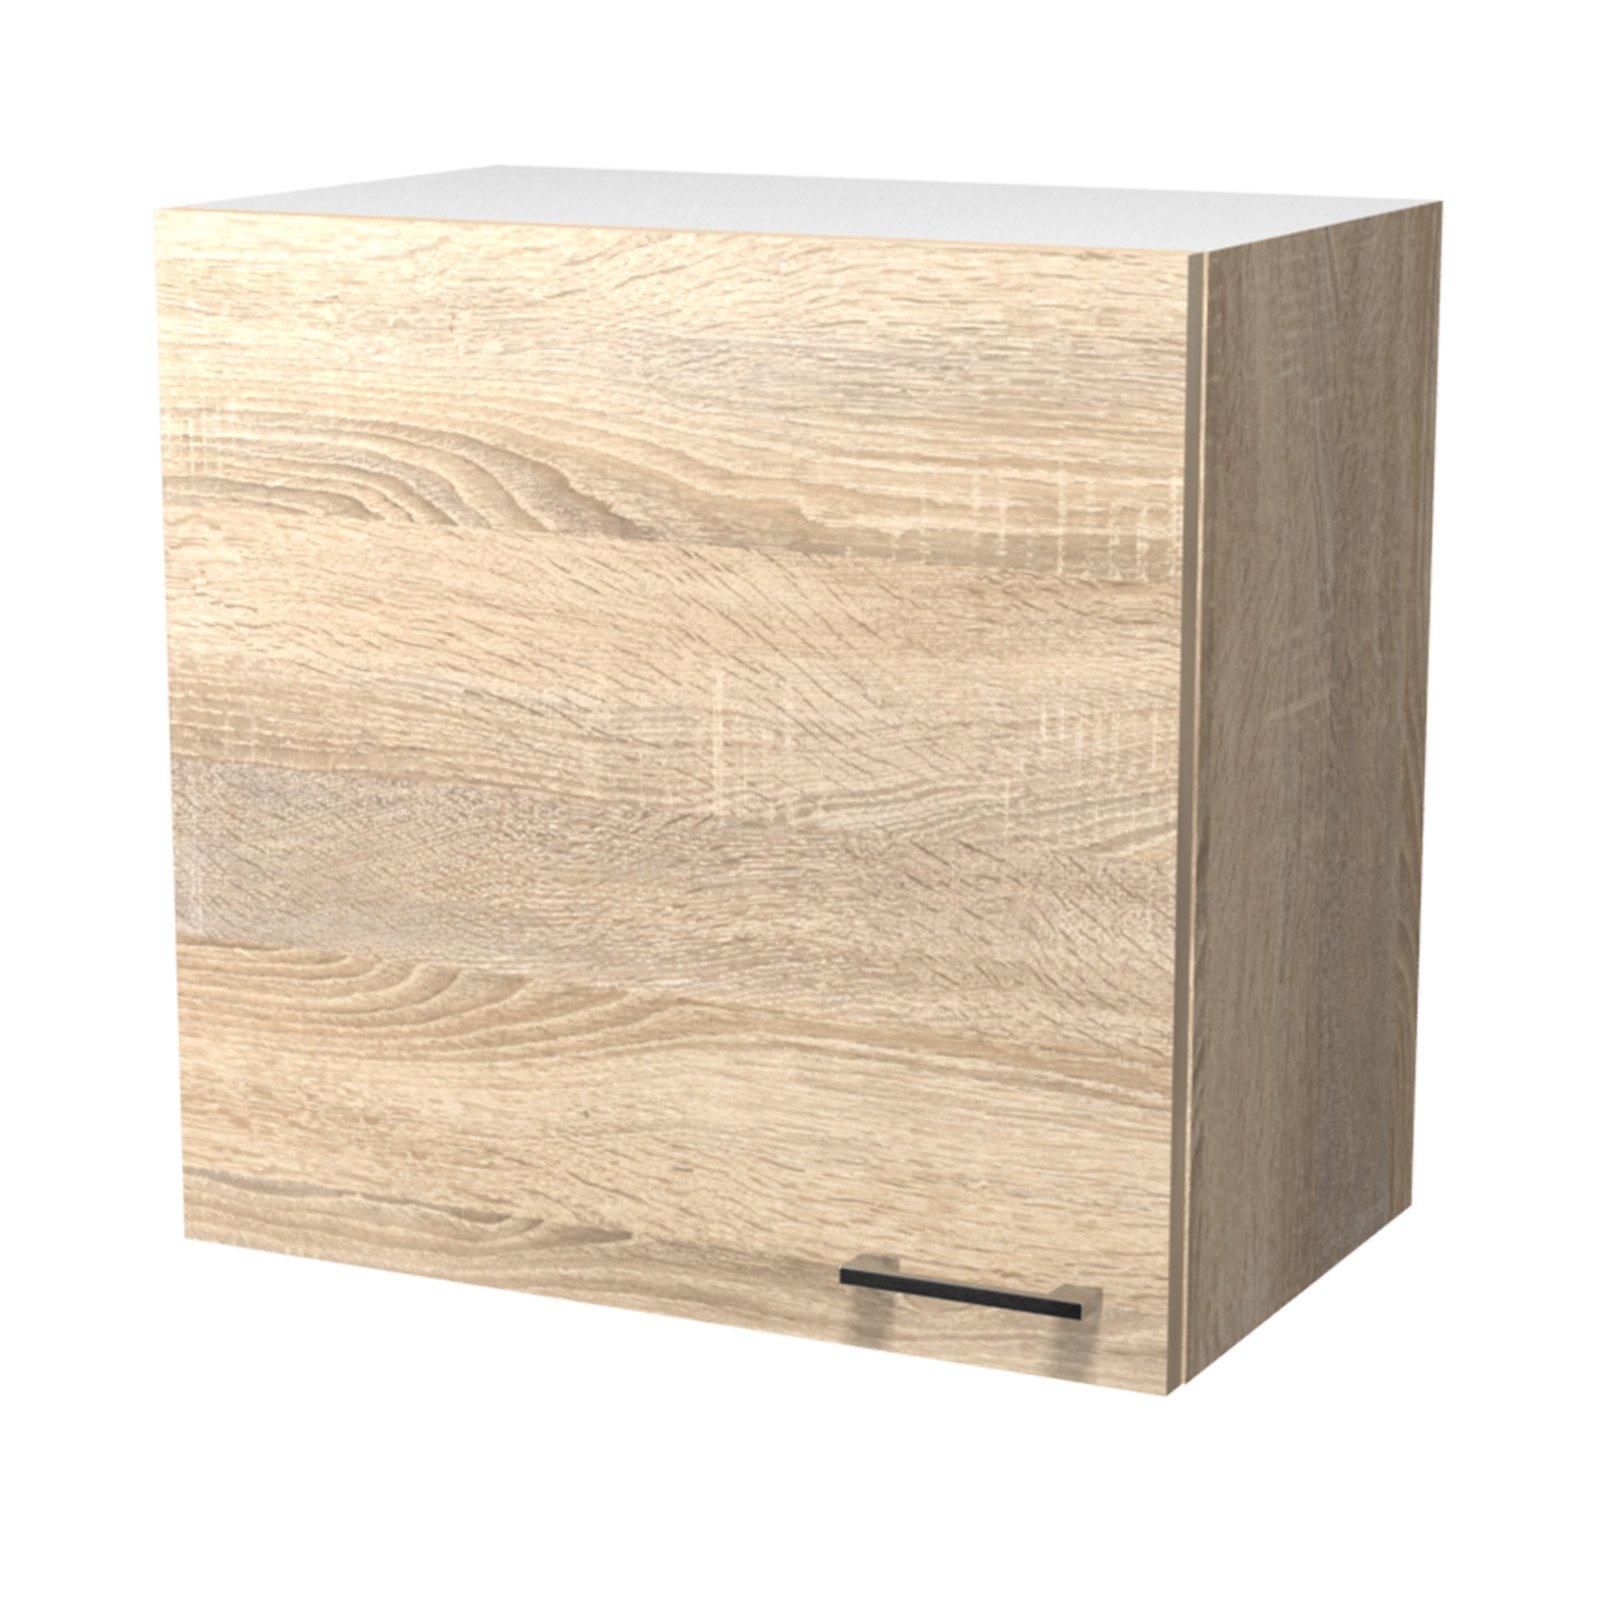 h ngeschrank samoa sonoma eiche 60 cm k che samoa schrankserien k chenschr nke m bel. Black Bedroom Furniture Sets. Home Design Ideas